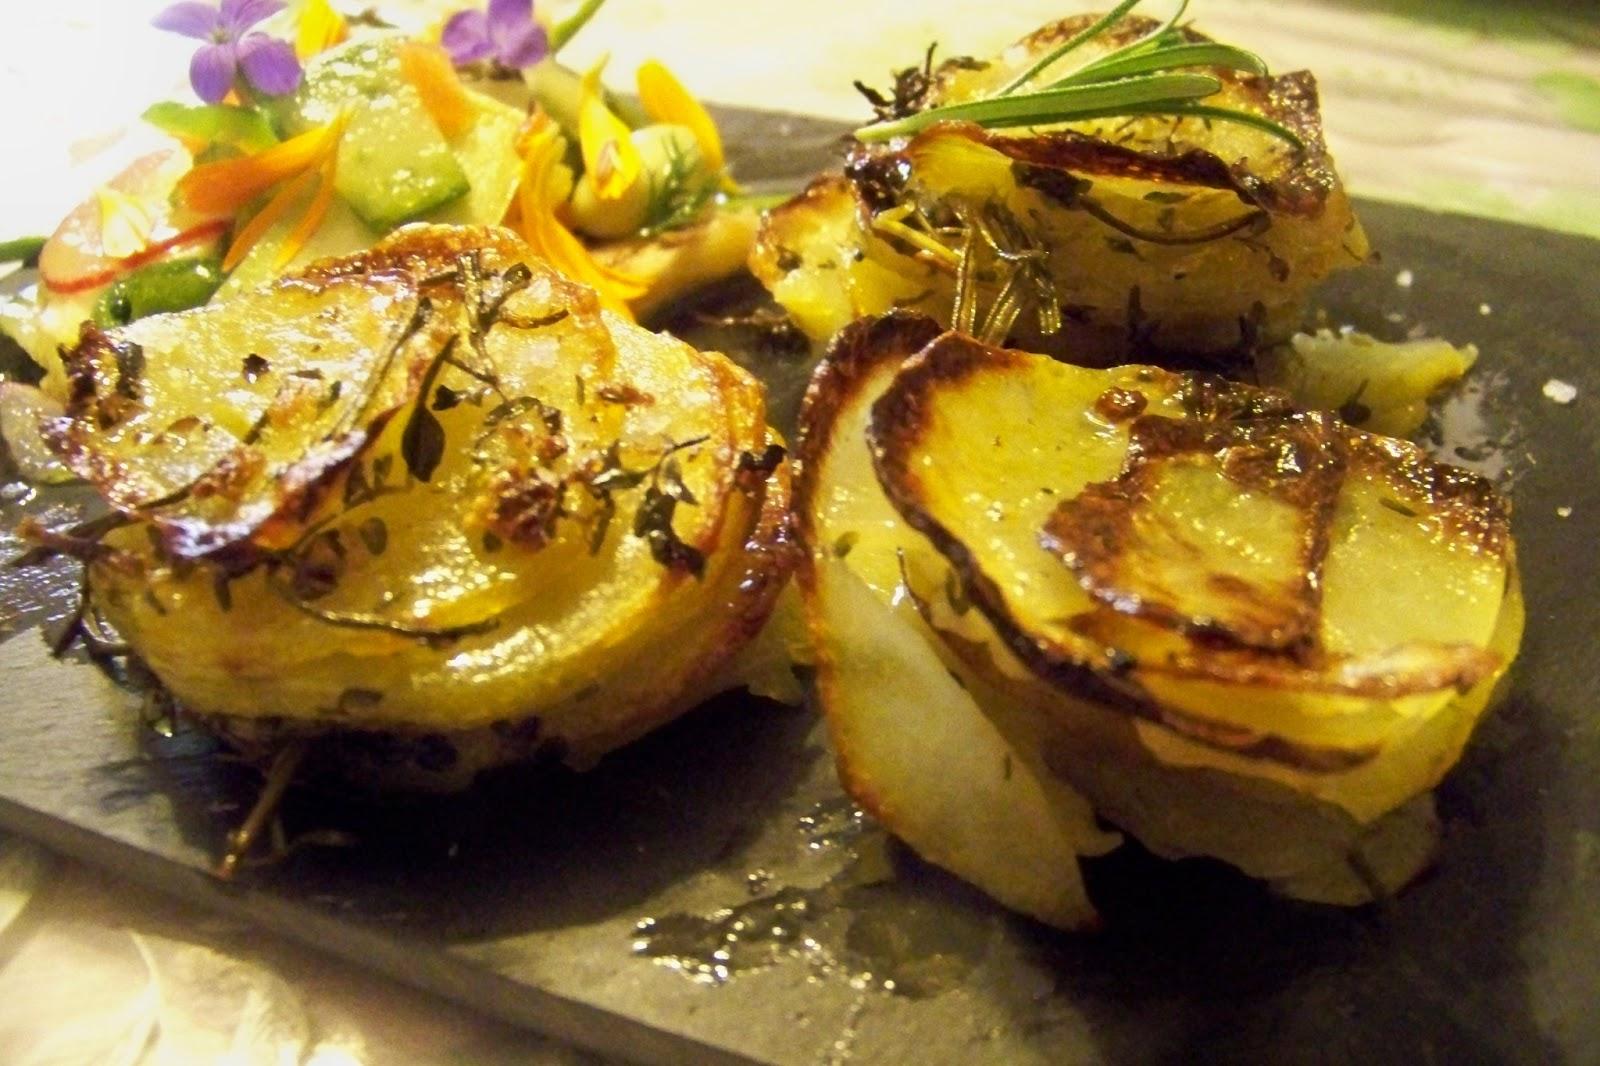 Cuisine en folie pommes de terre en mille feuilles - Feuille pomme de terre ...